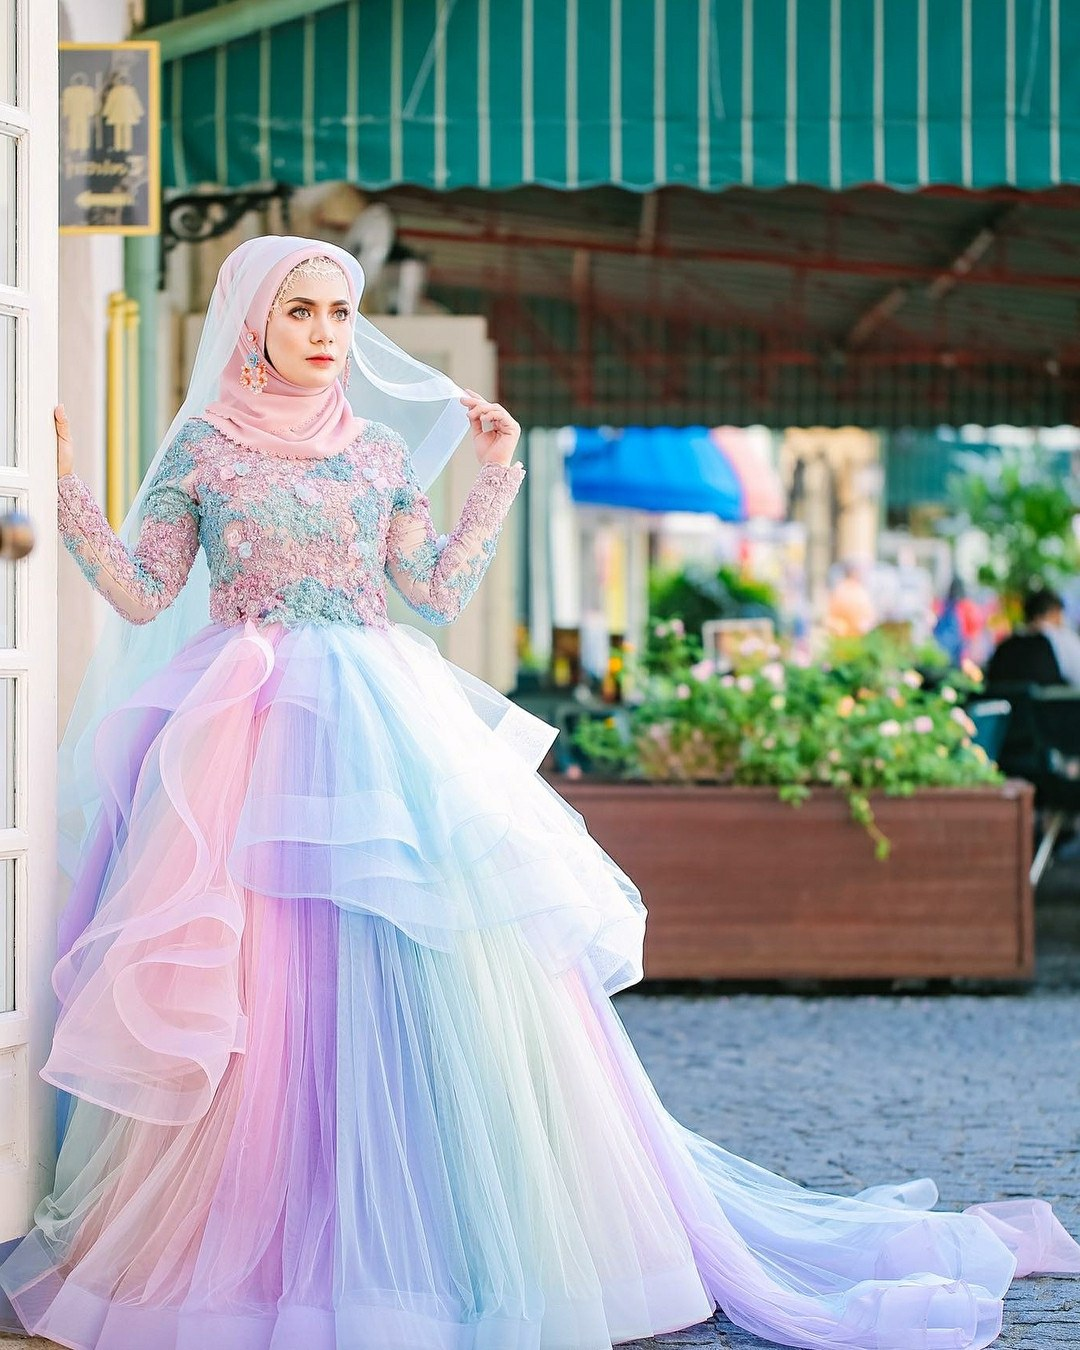 Design Foto Gaun Pengantin Muslimah 3ldq 34 Inspirasi Terpopuler Gaun Pengantin Malaysia